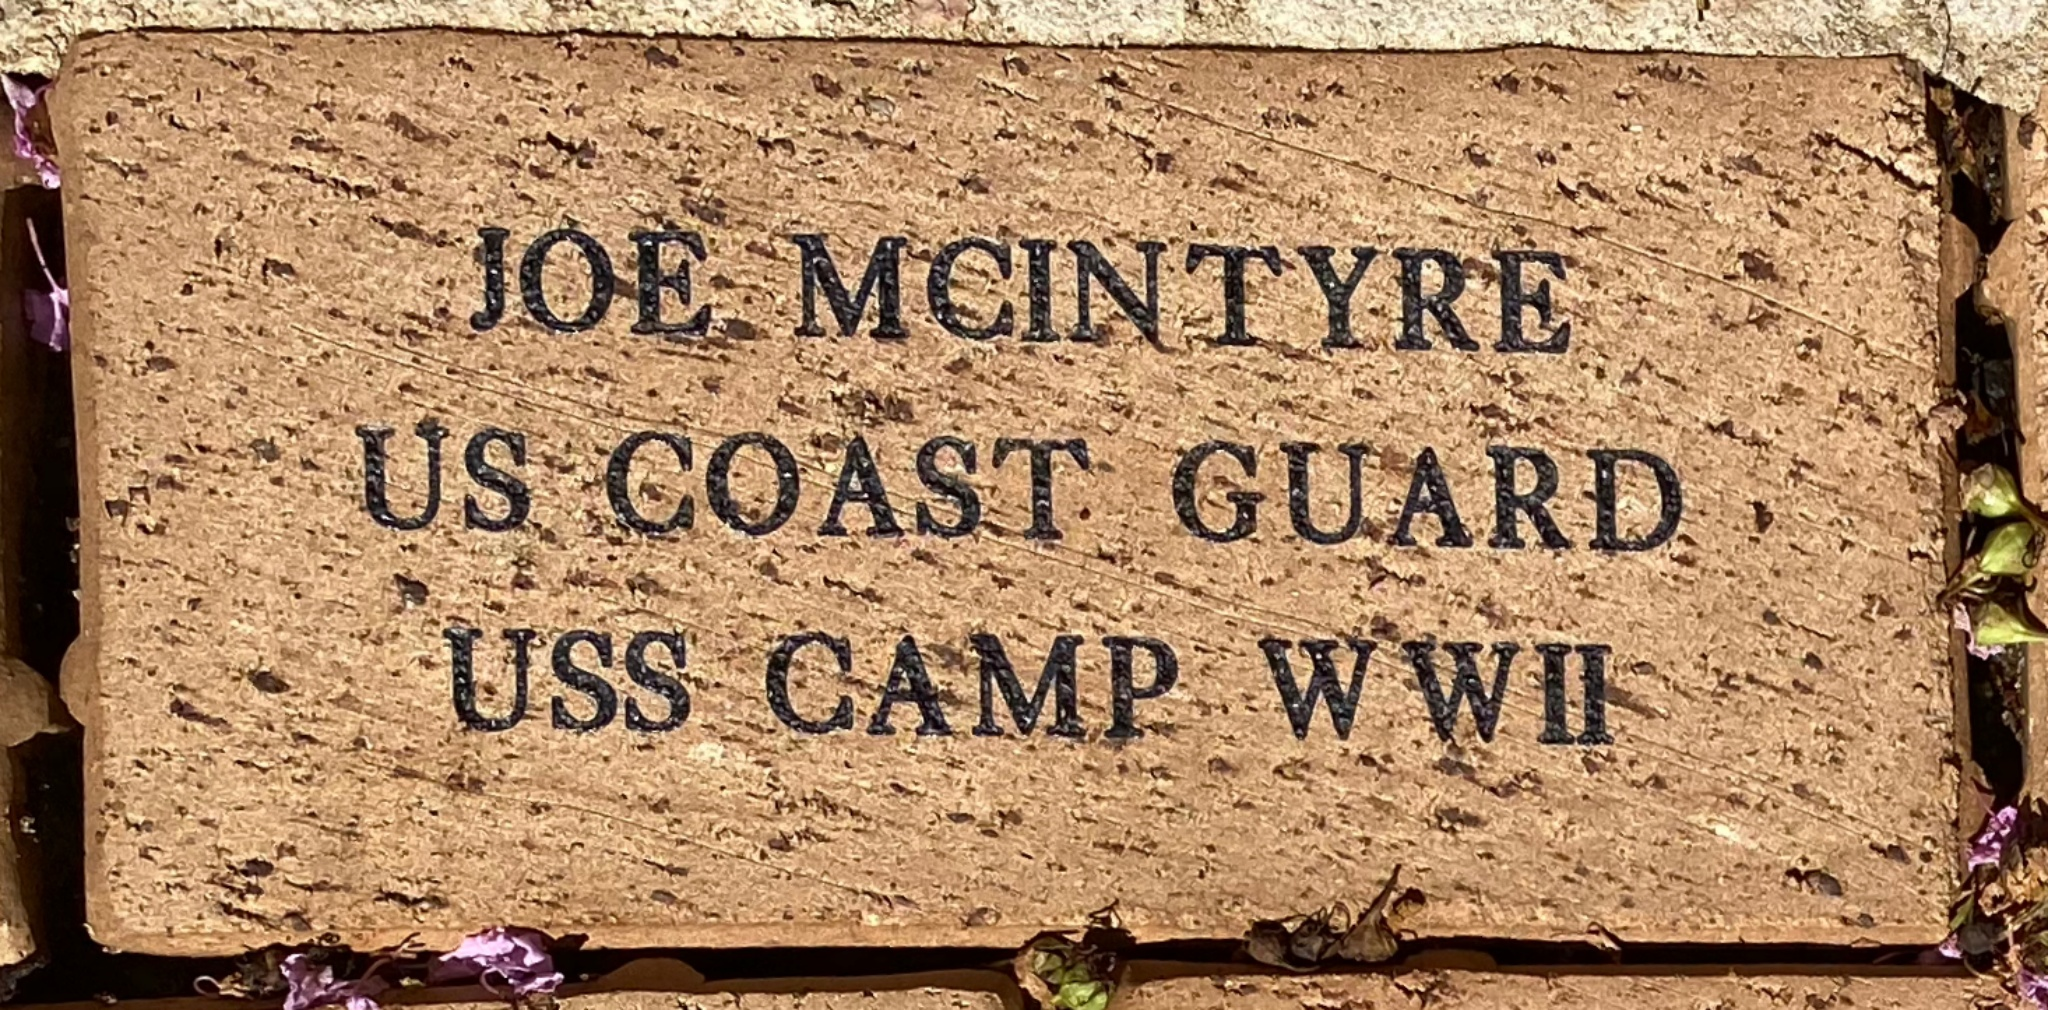 JOE MCINTYRE US COAST GUARD USS CAMP WWII